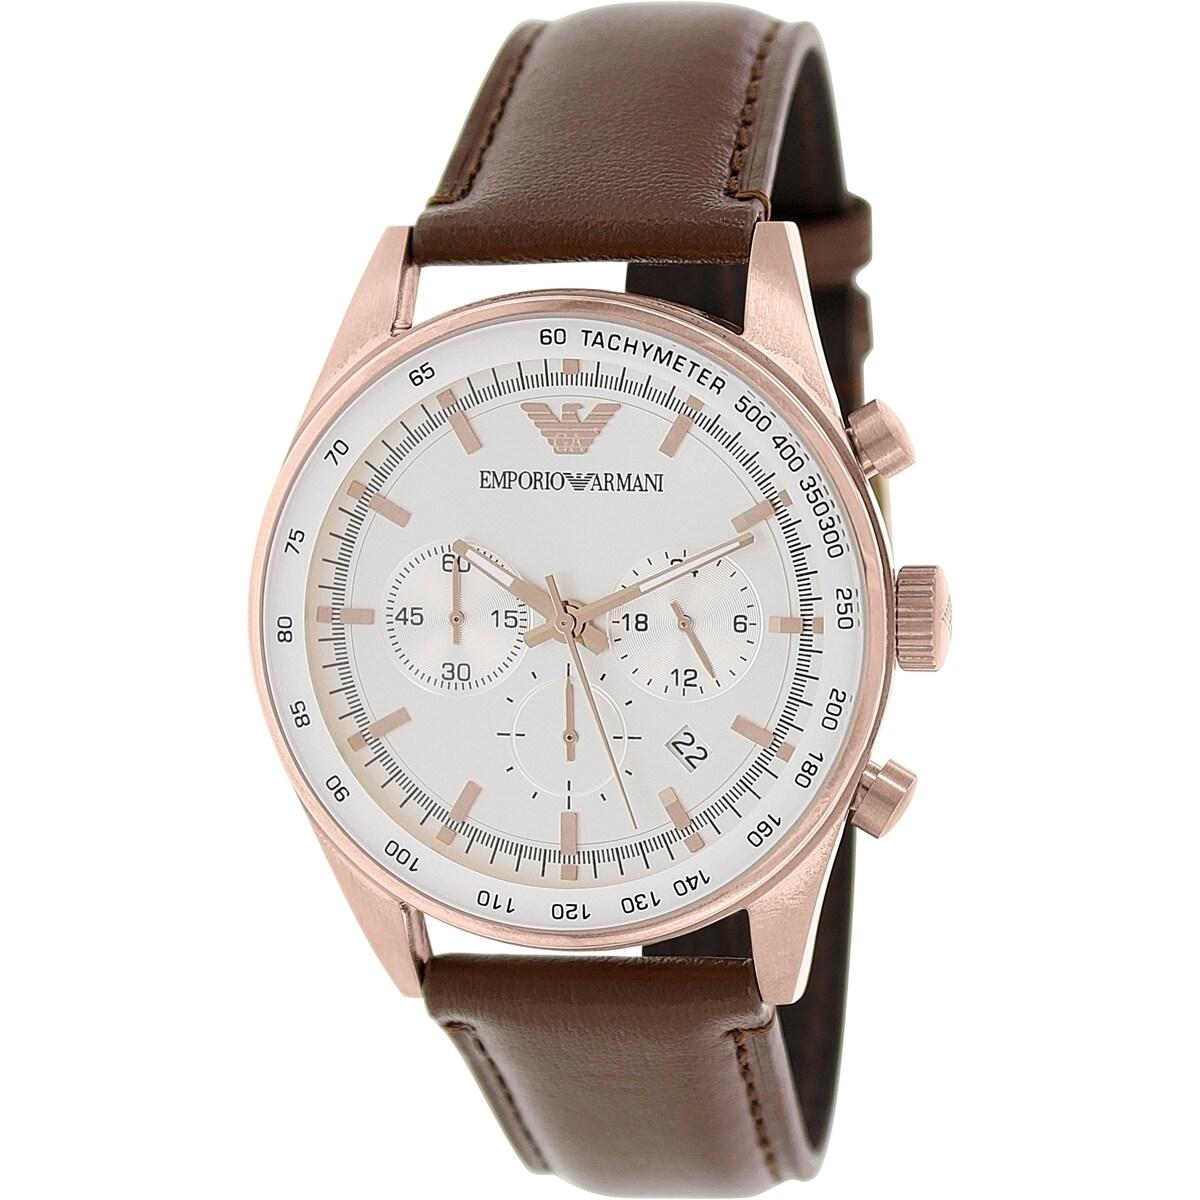 45e1e69d5 Shop Emporio Armani Men's Sportivo AR5995 Brown Leather Quartz Watch with Silver  Dial - Ships To Canada - Overstock - 9614230